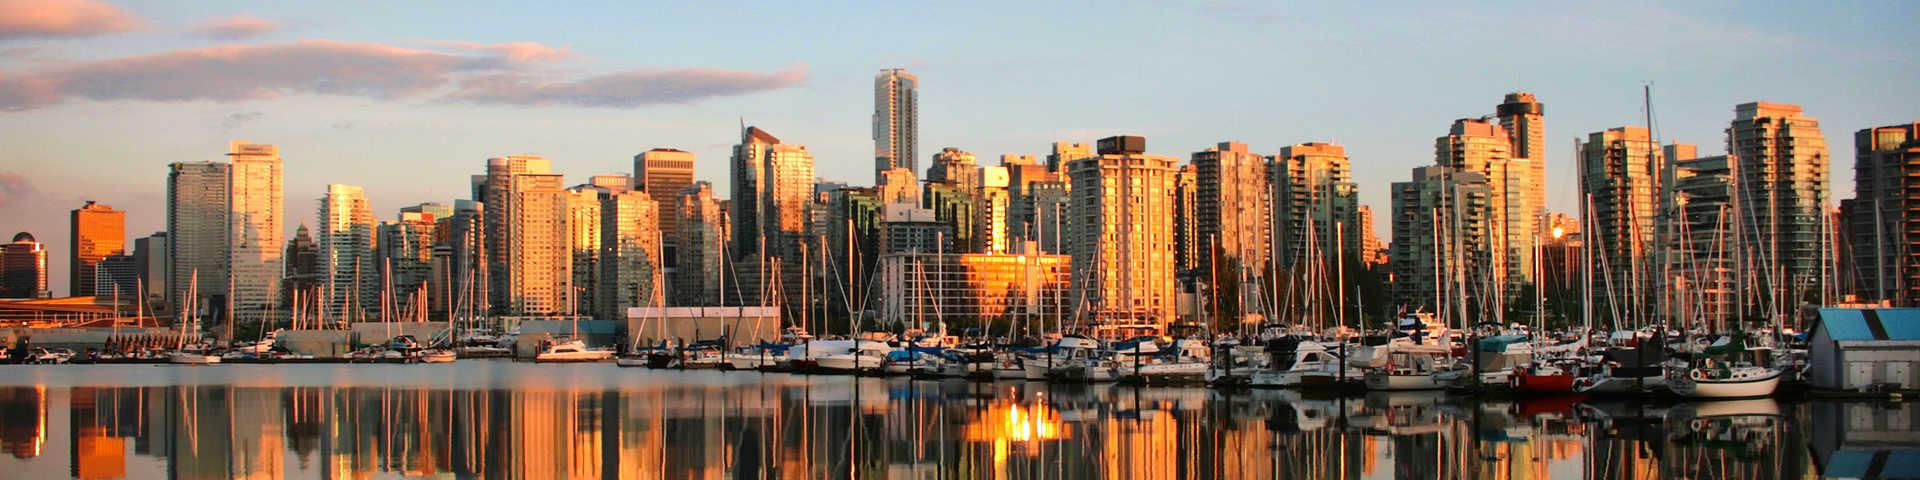 Boyden Global Executive Search - Calgary, AB, Canada - Yelp